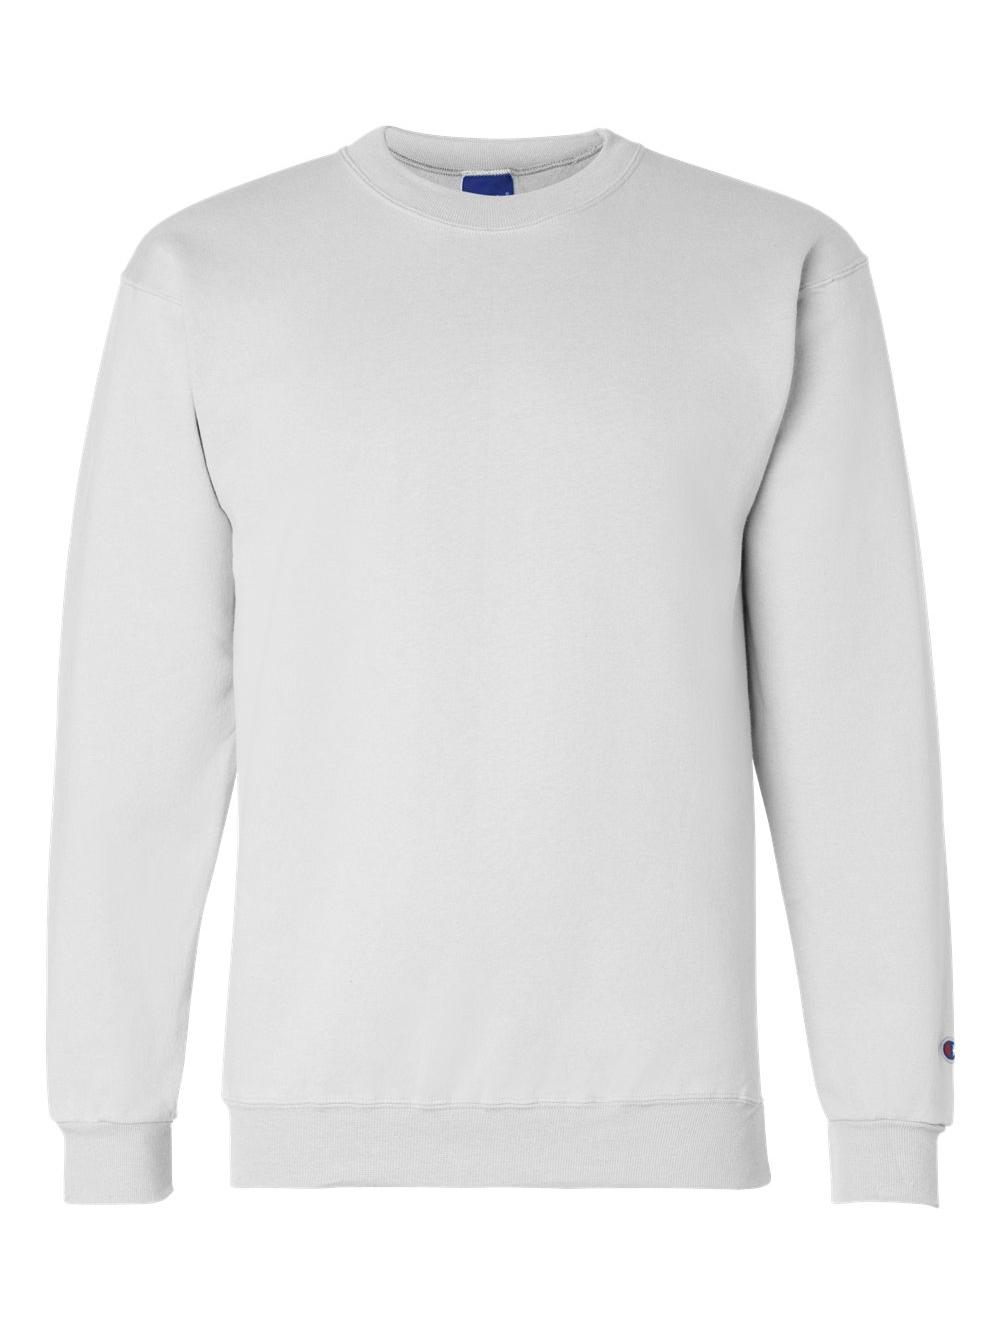 Champion-Double-Dry-Eco-Crewneck-Sweatshirt-S600 thumbnail 36